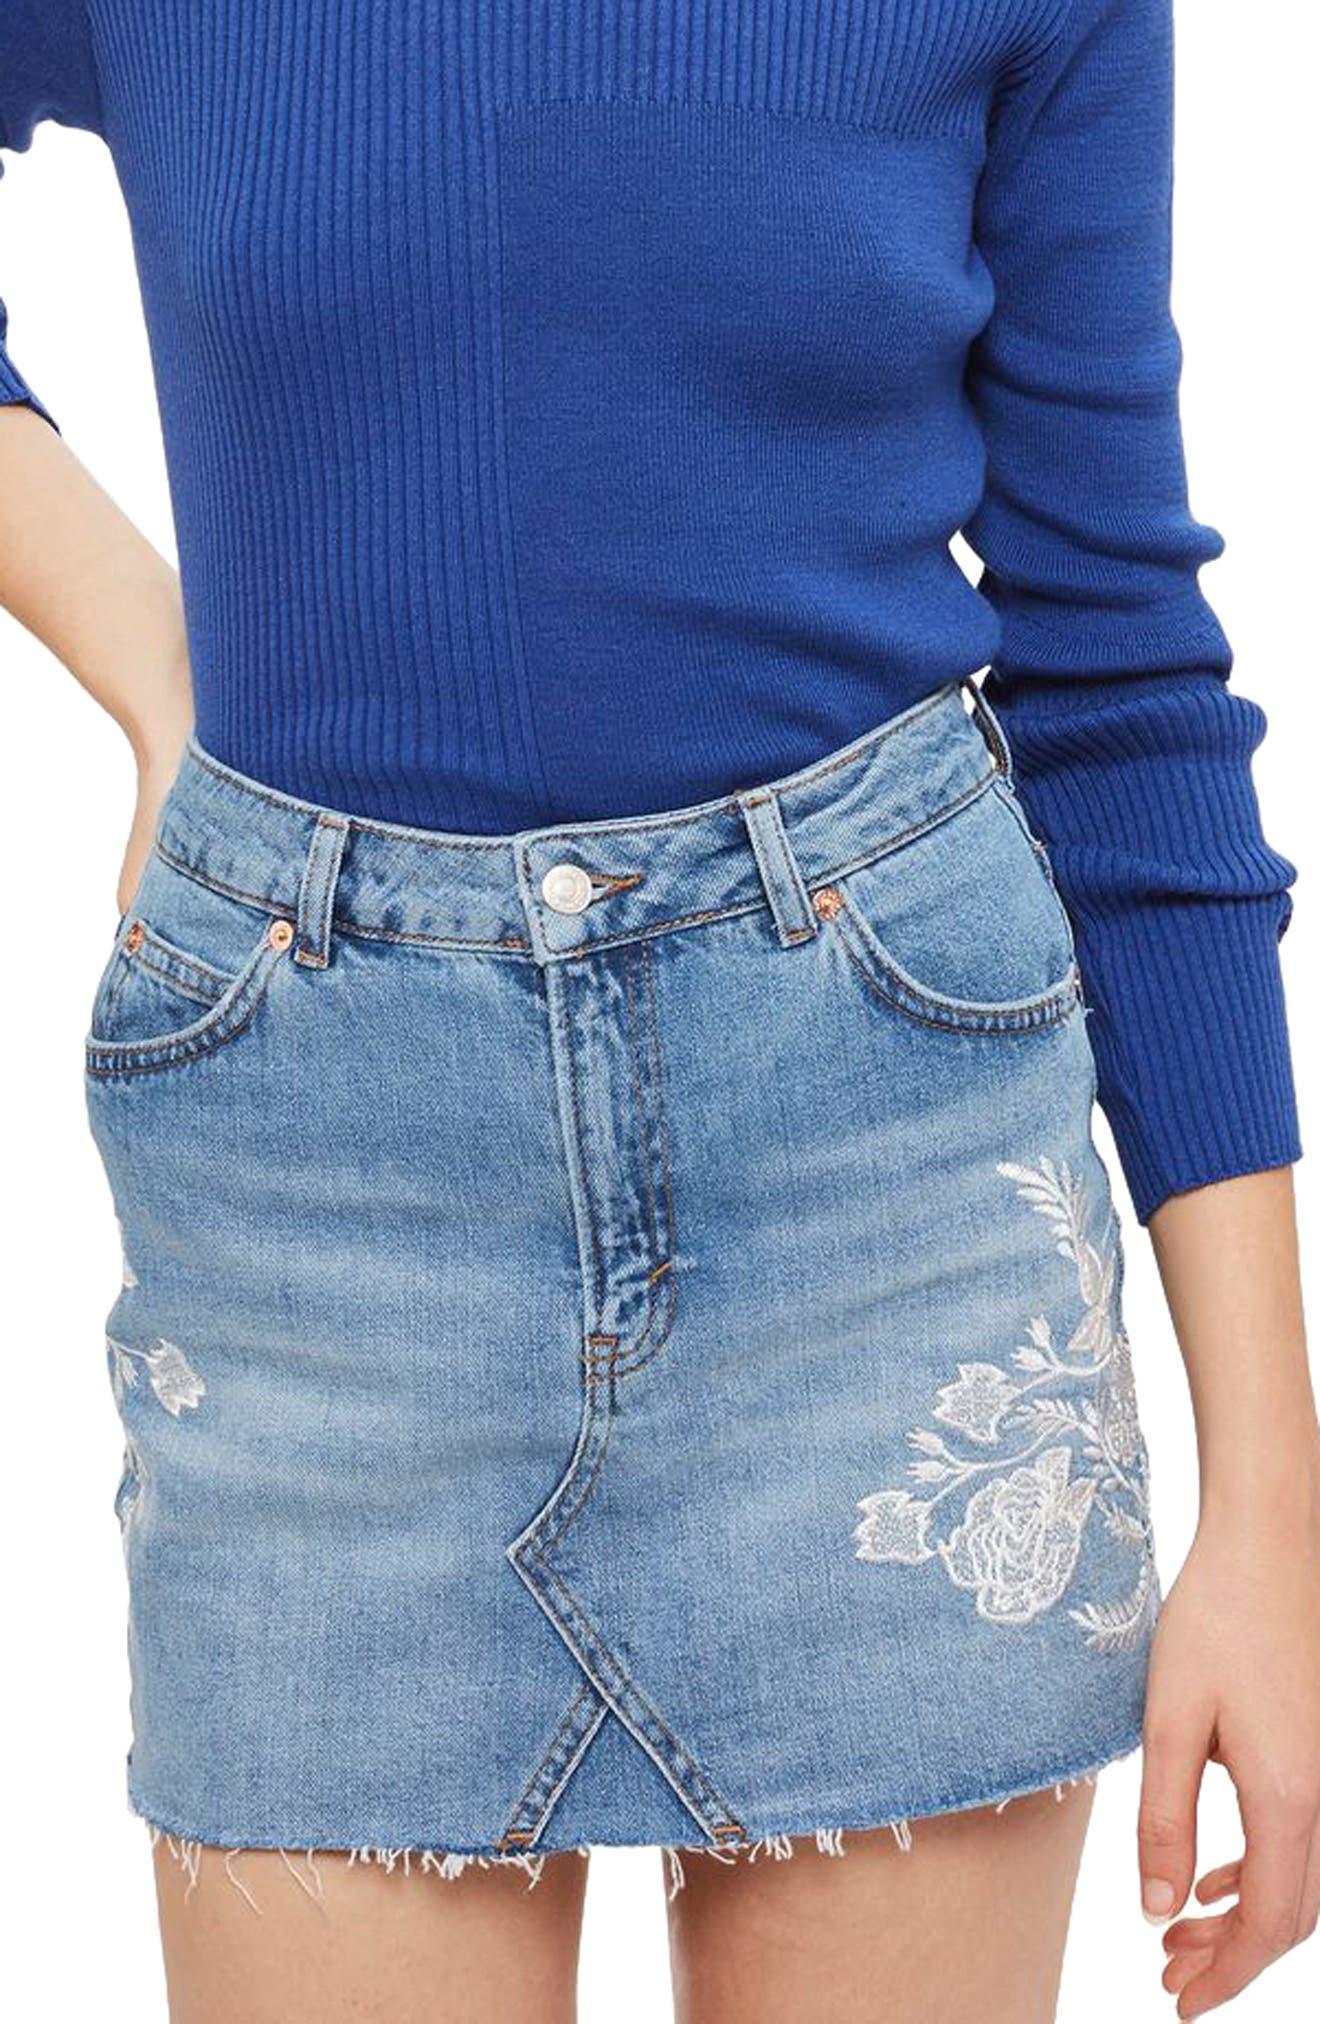 Alternate Image 1 Selected - Topshop Embroidered Denim Miniskirt